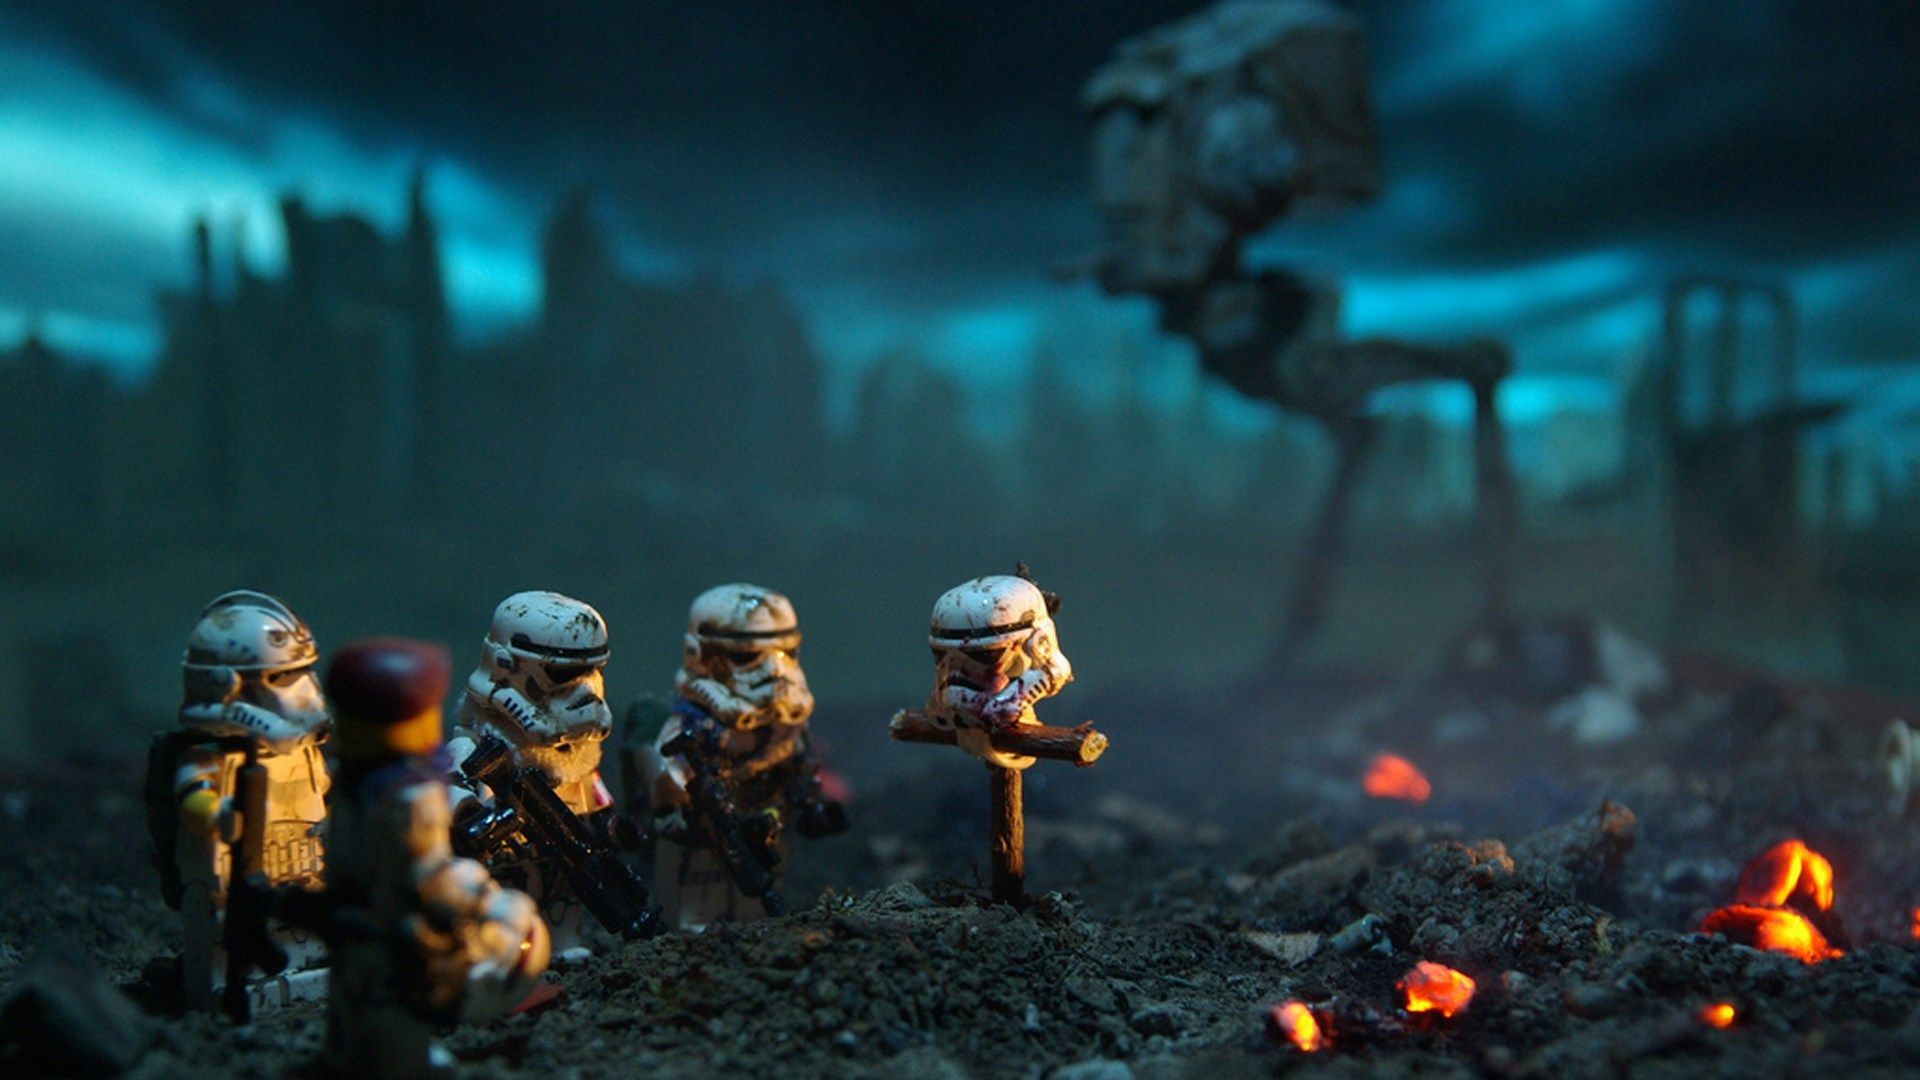 1920x1080 Widescreen Wallpaper Star Wars Star Wars Illustration Star Wars Wallpaper Lego Stormtrooper